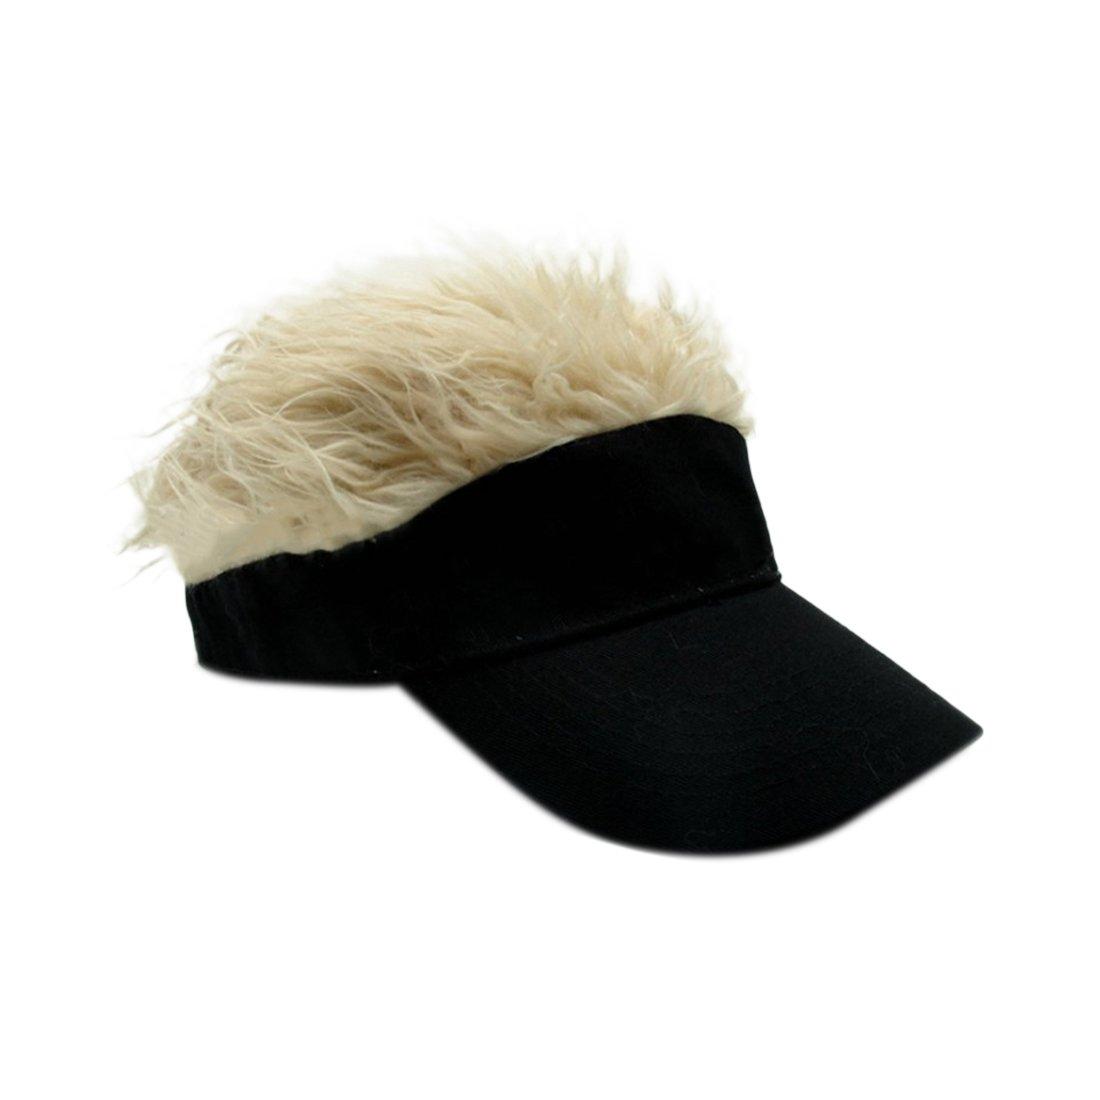 xzbailisha HAT ユニセックスアダルト B07CQPYCSD One Size|カラー7 カラー7 One Size